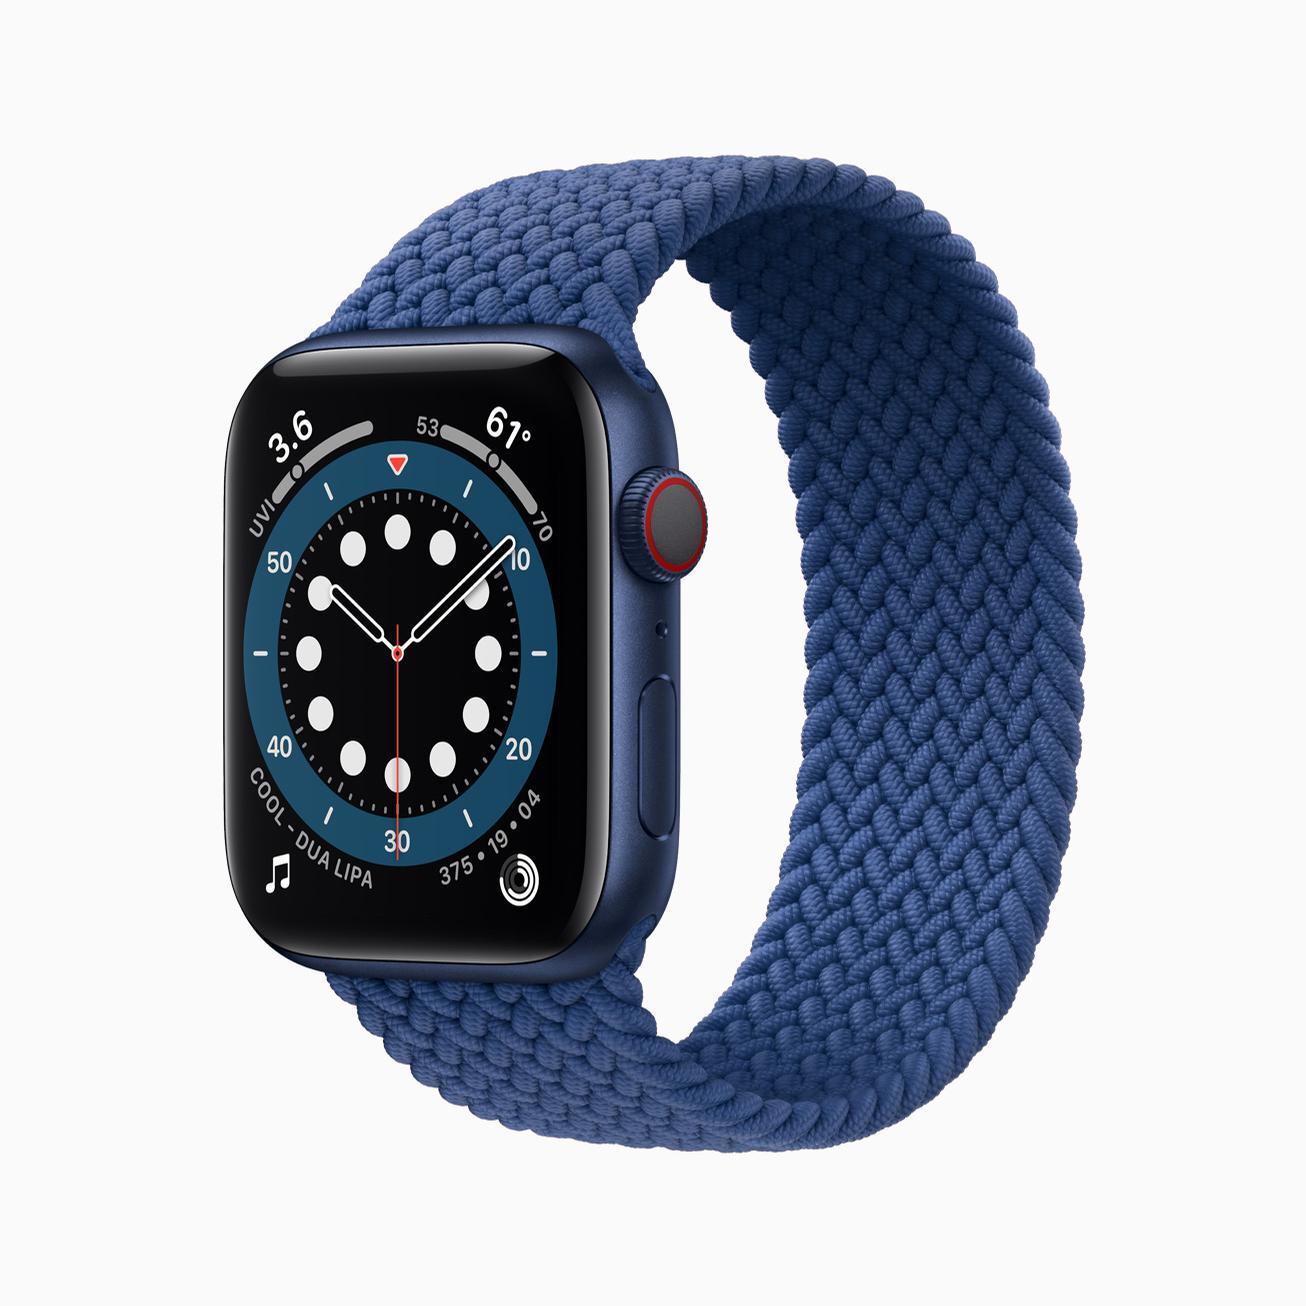 Apple Watch Series 6 features oxygen saturation measurement / Apple